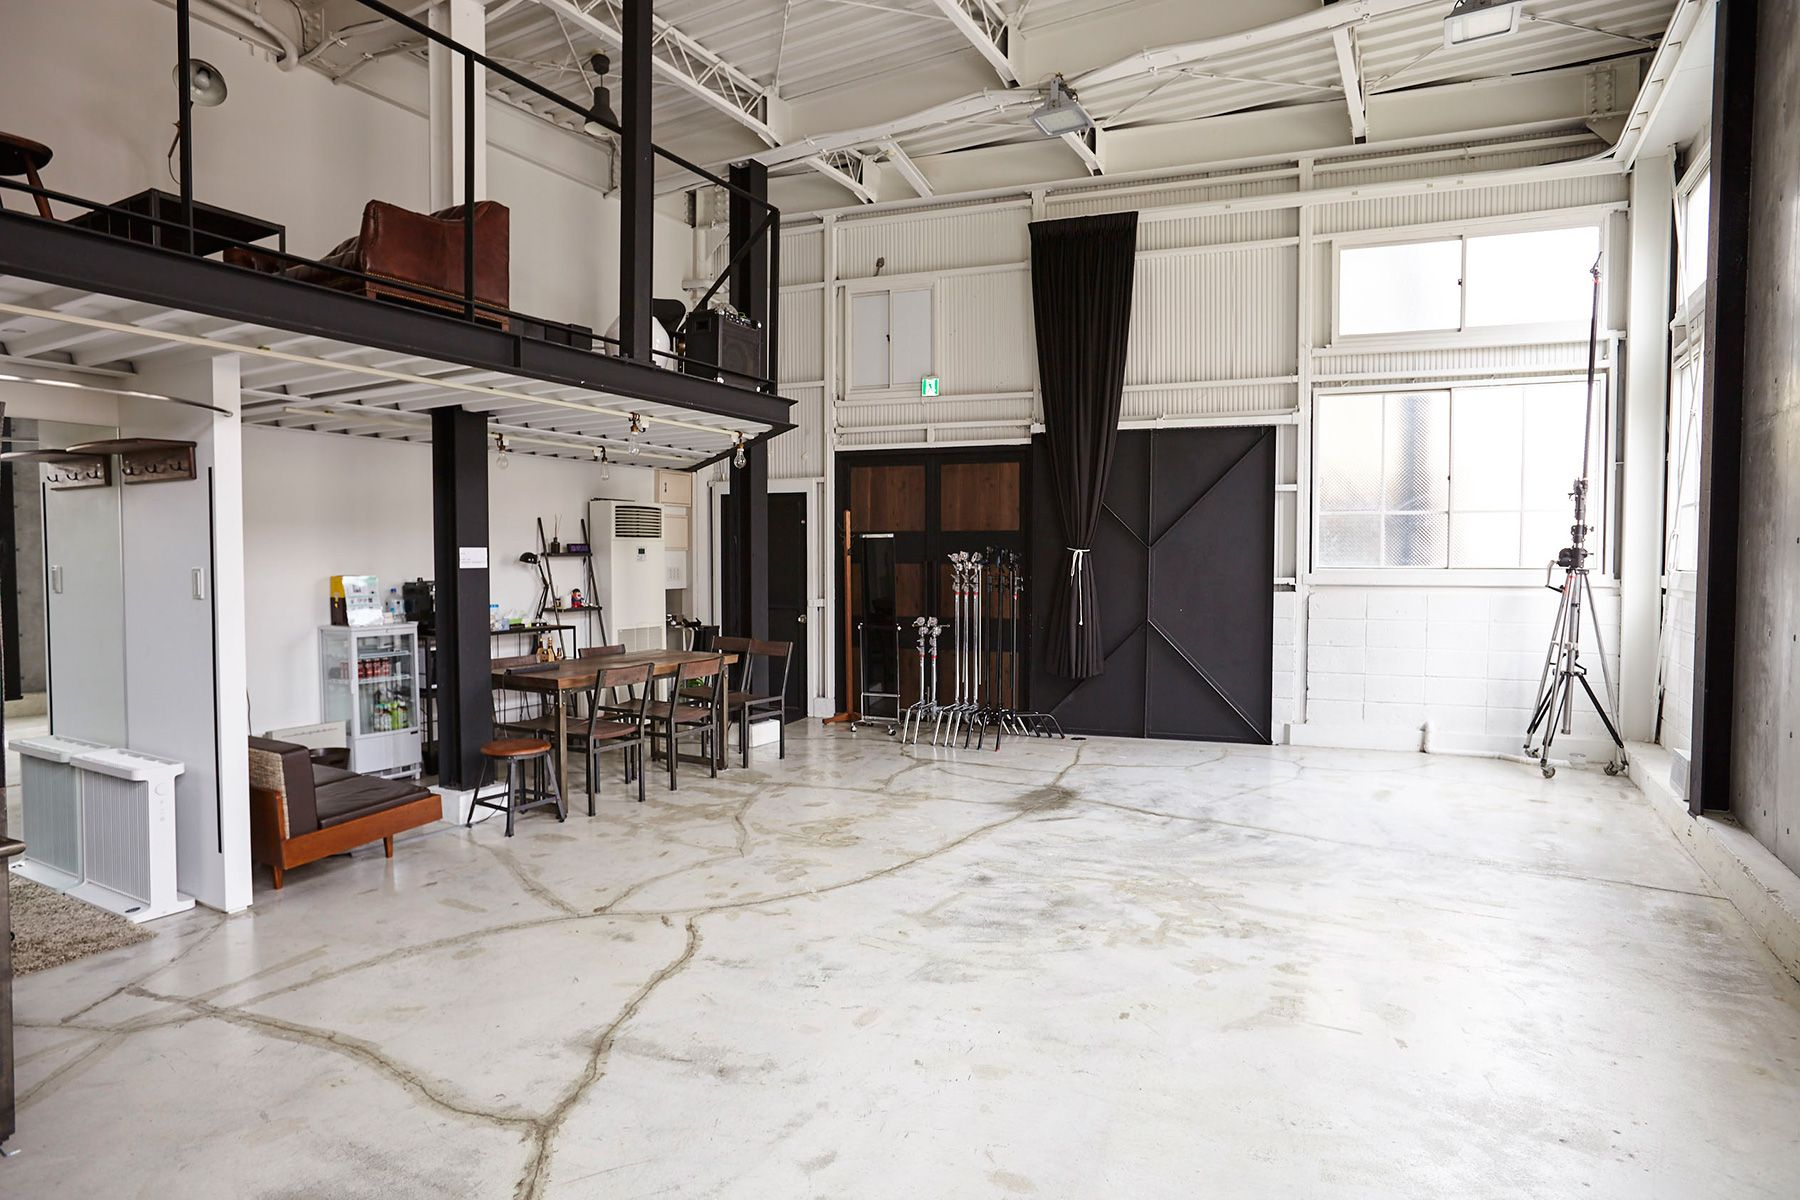 Studio I-AM (スタジオ アイアム)1F